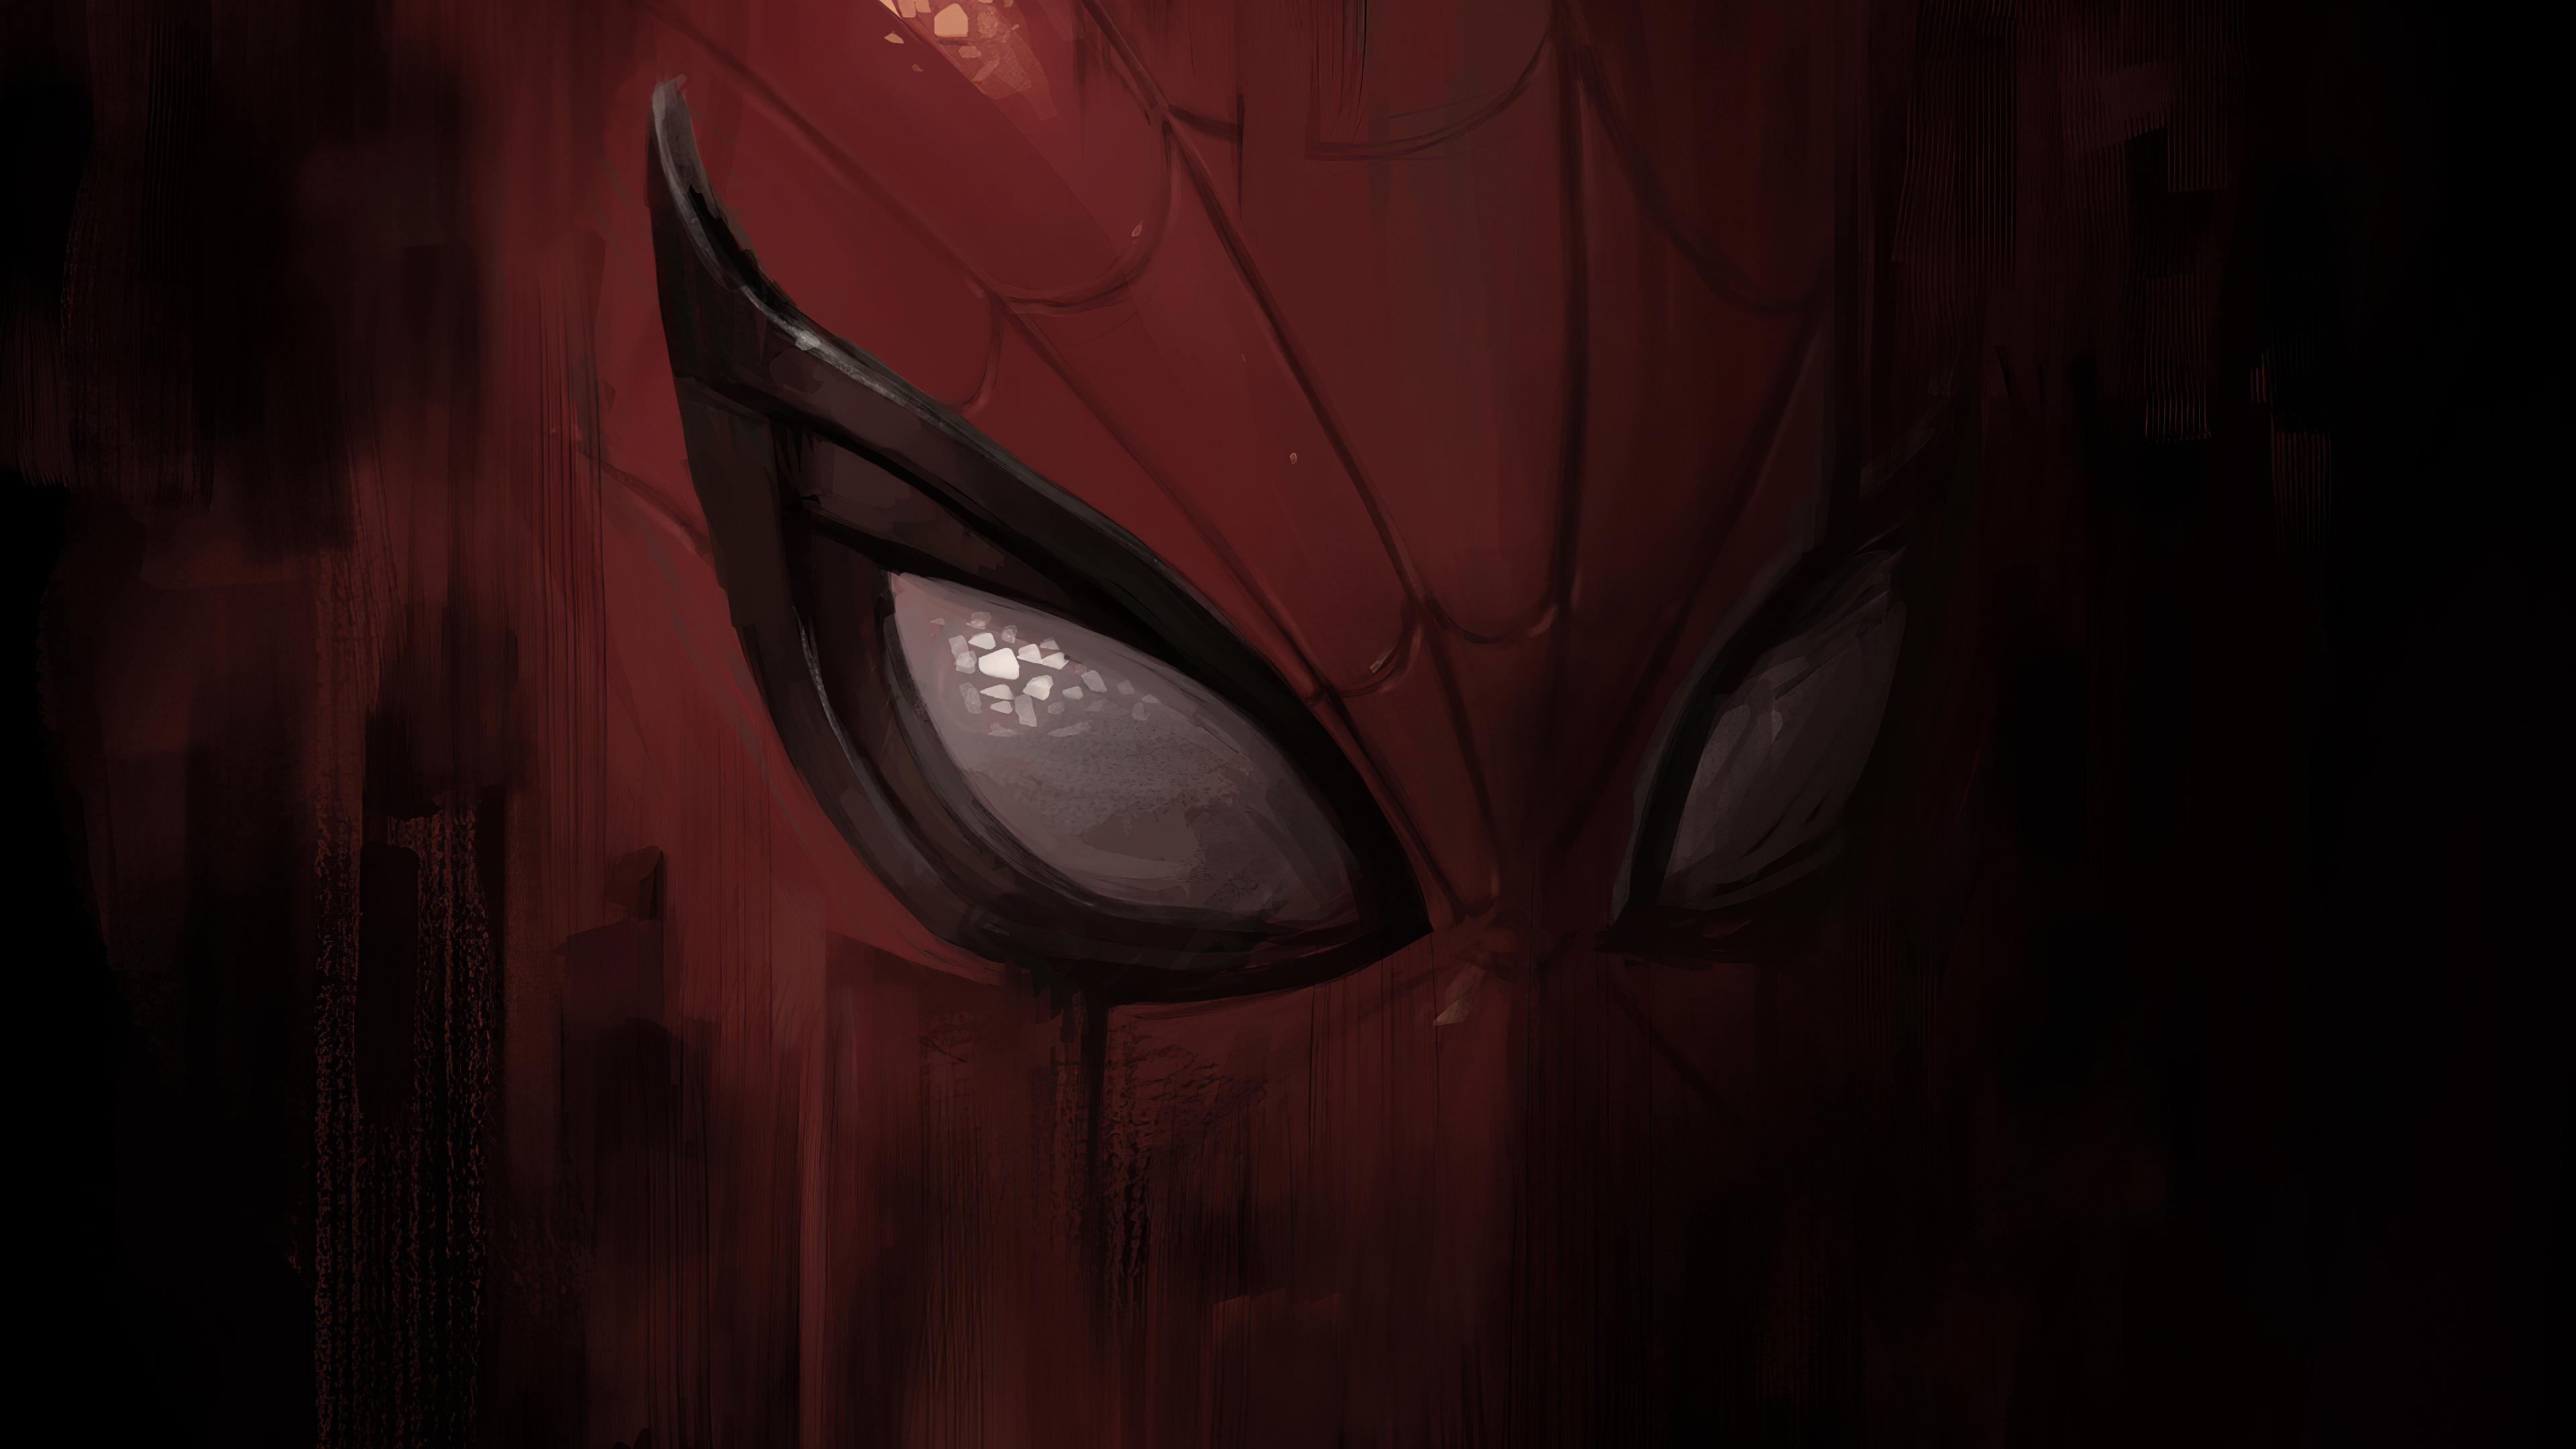 spiderman mask 1576090713 - Spiderman Mask - spiderman mask art, spiderman mask 4k wallpaper